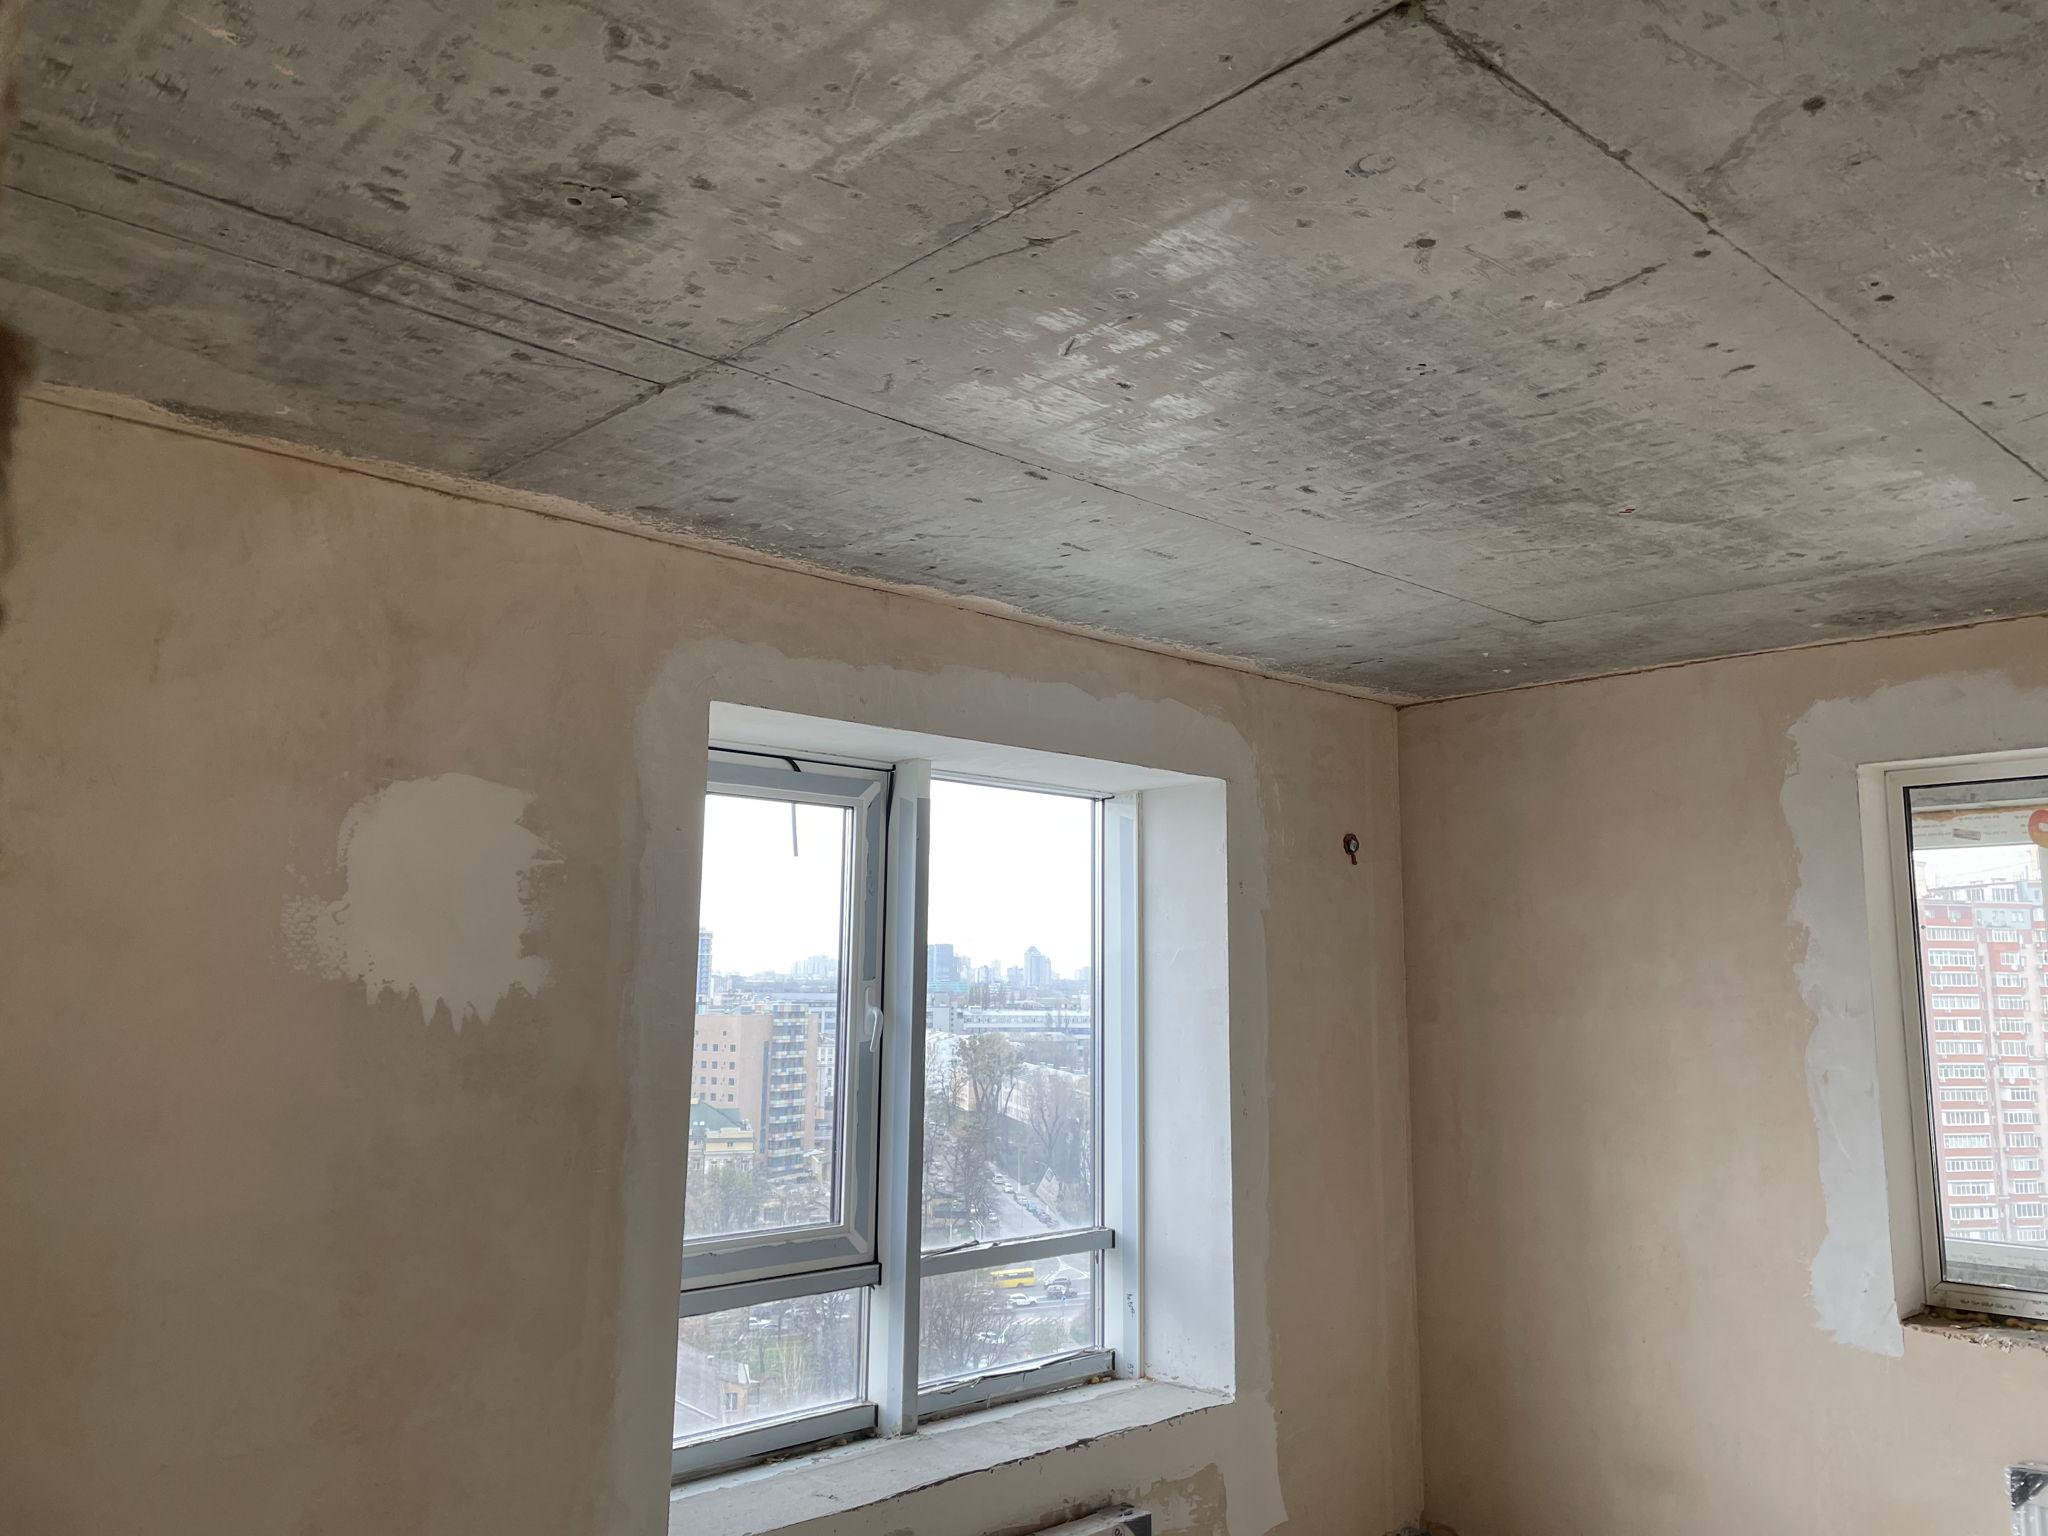 Квартира W-6388218, Златоустовская, 27, Киев - Фото 11